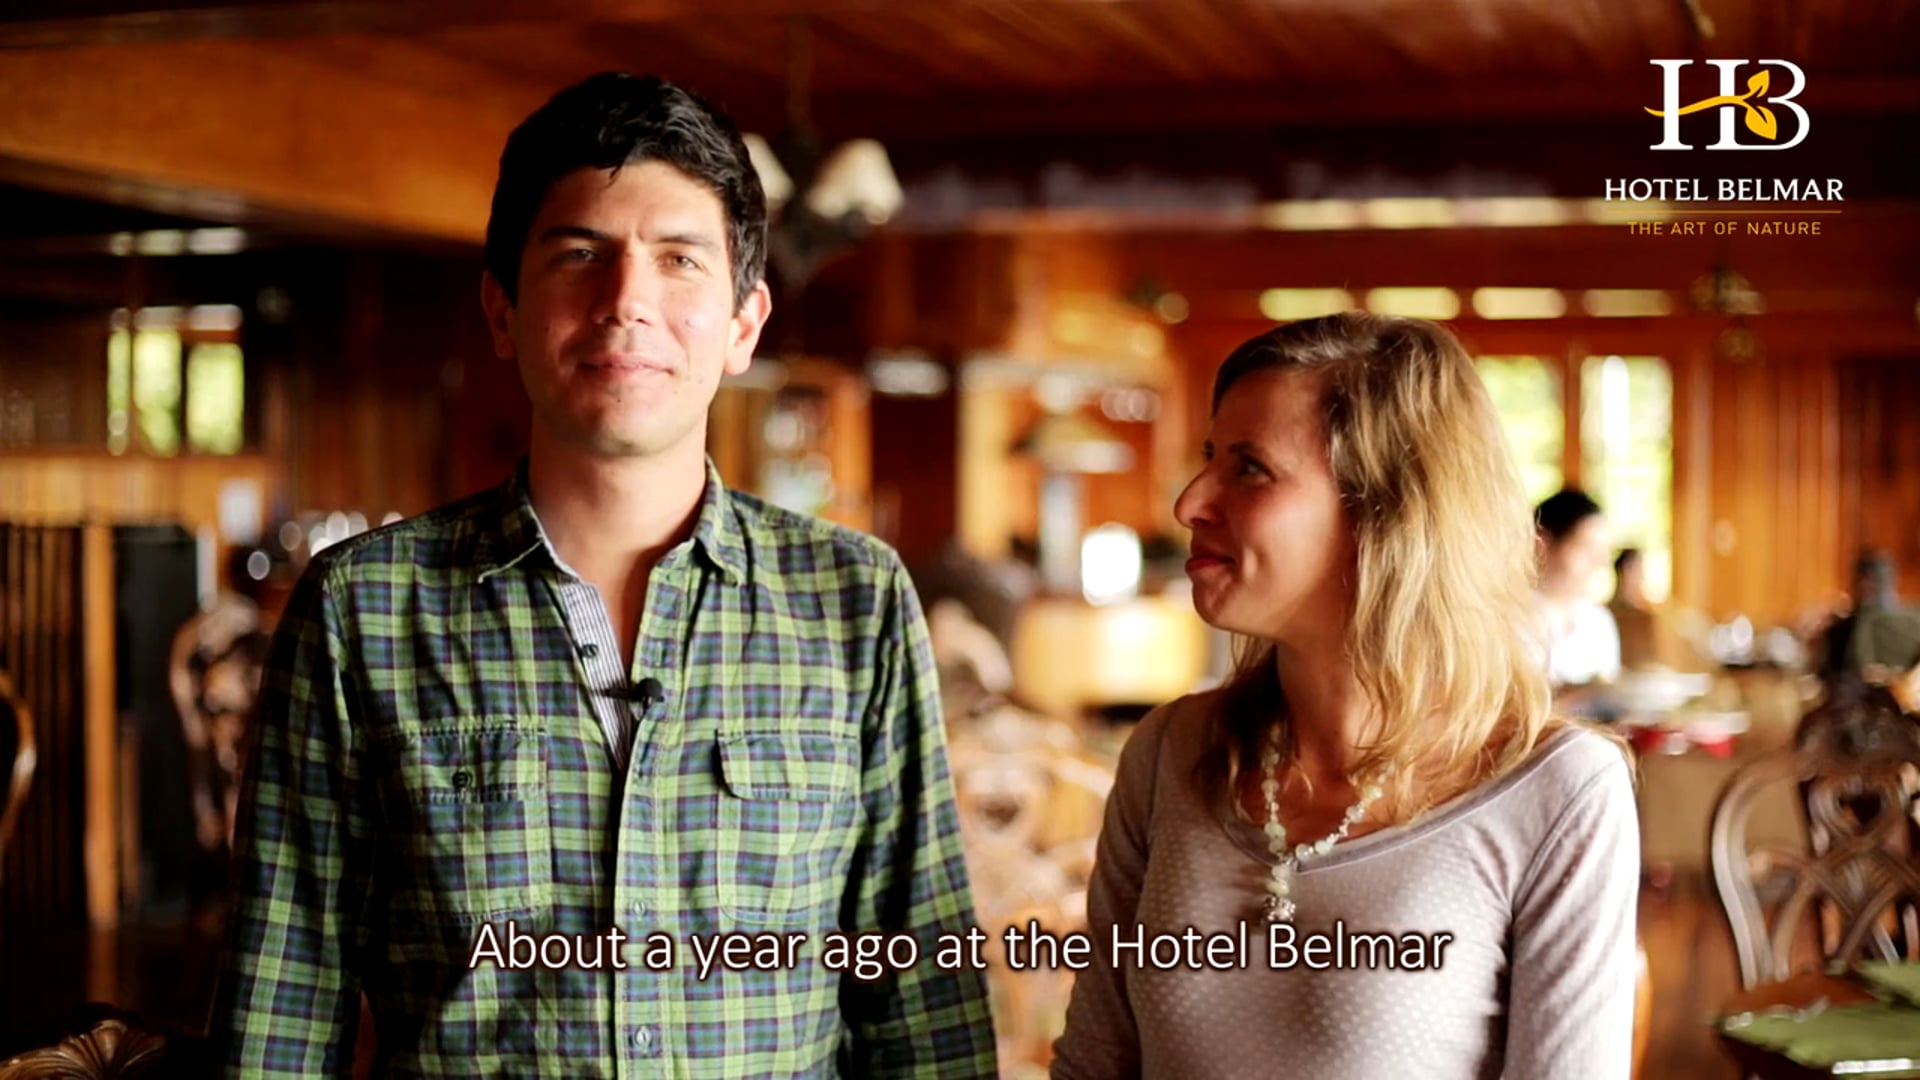 Hotel Belmar Cultura de Paz